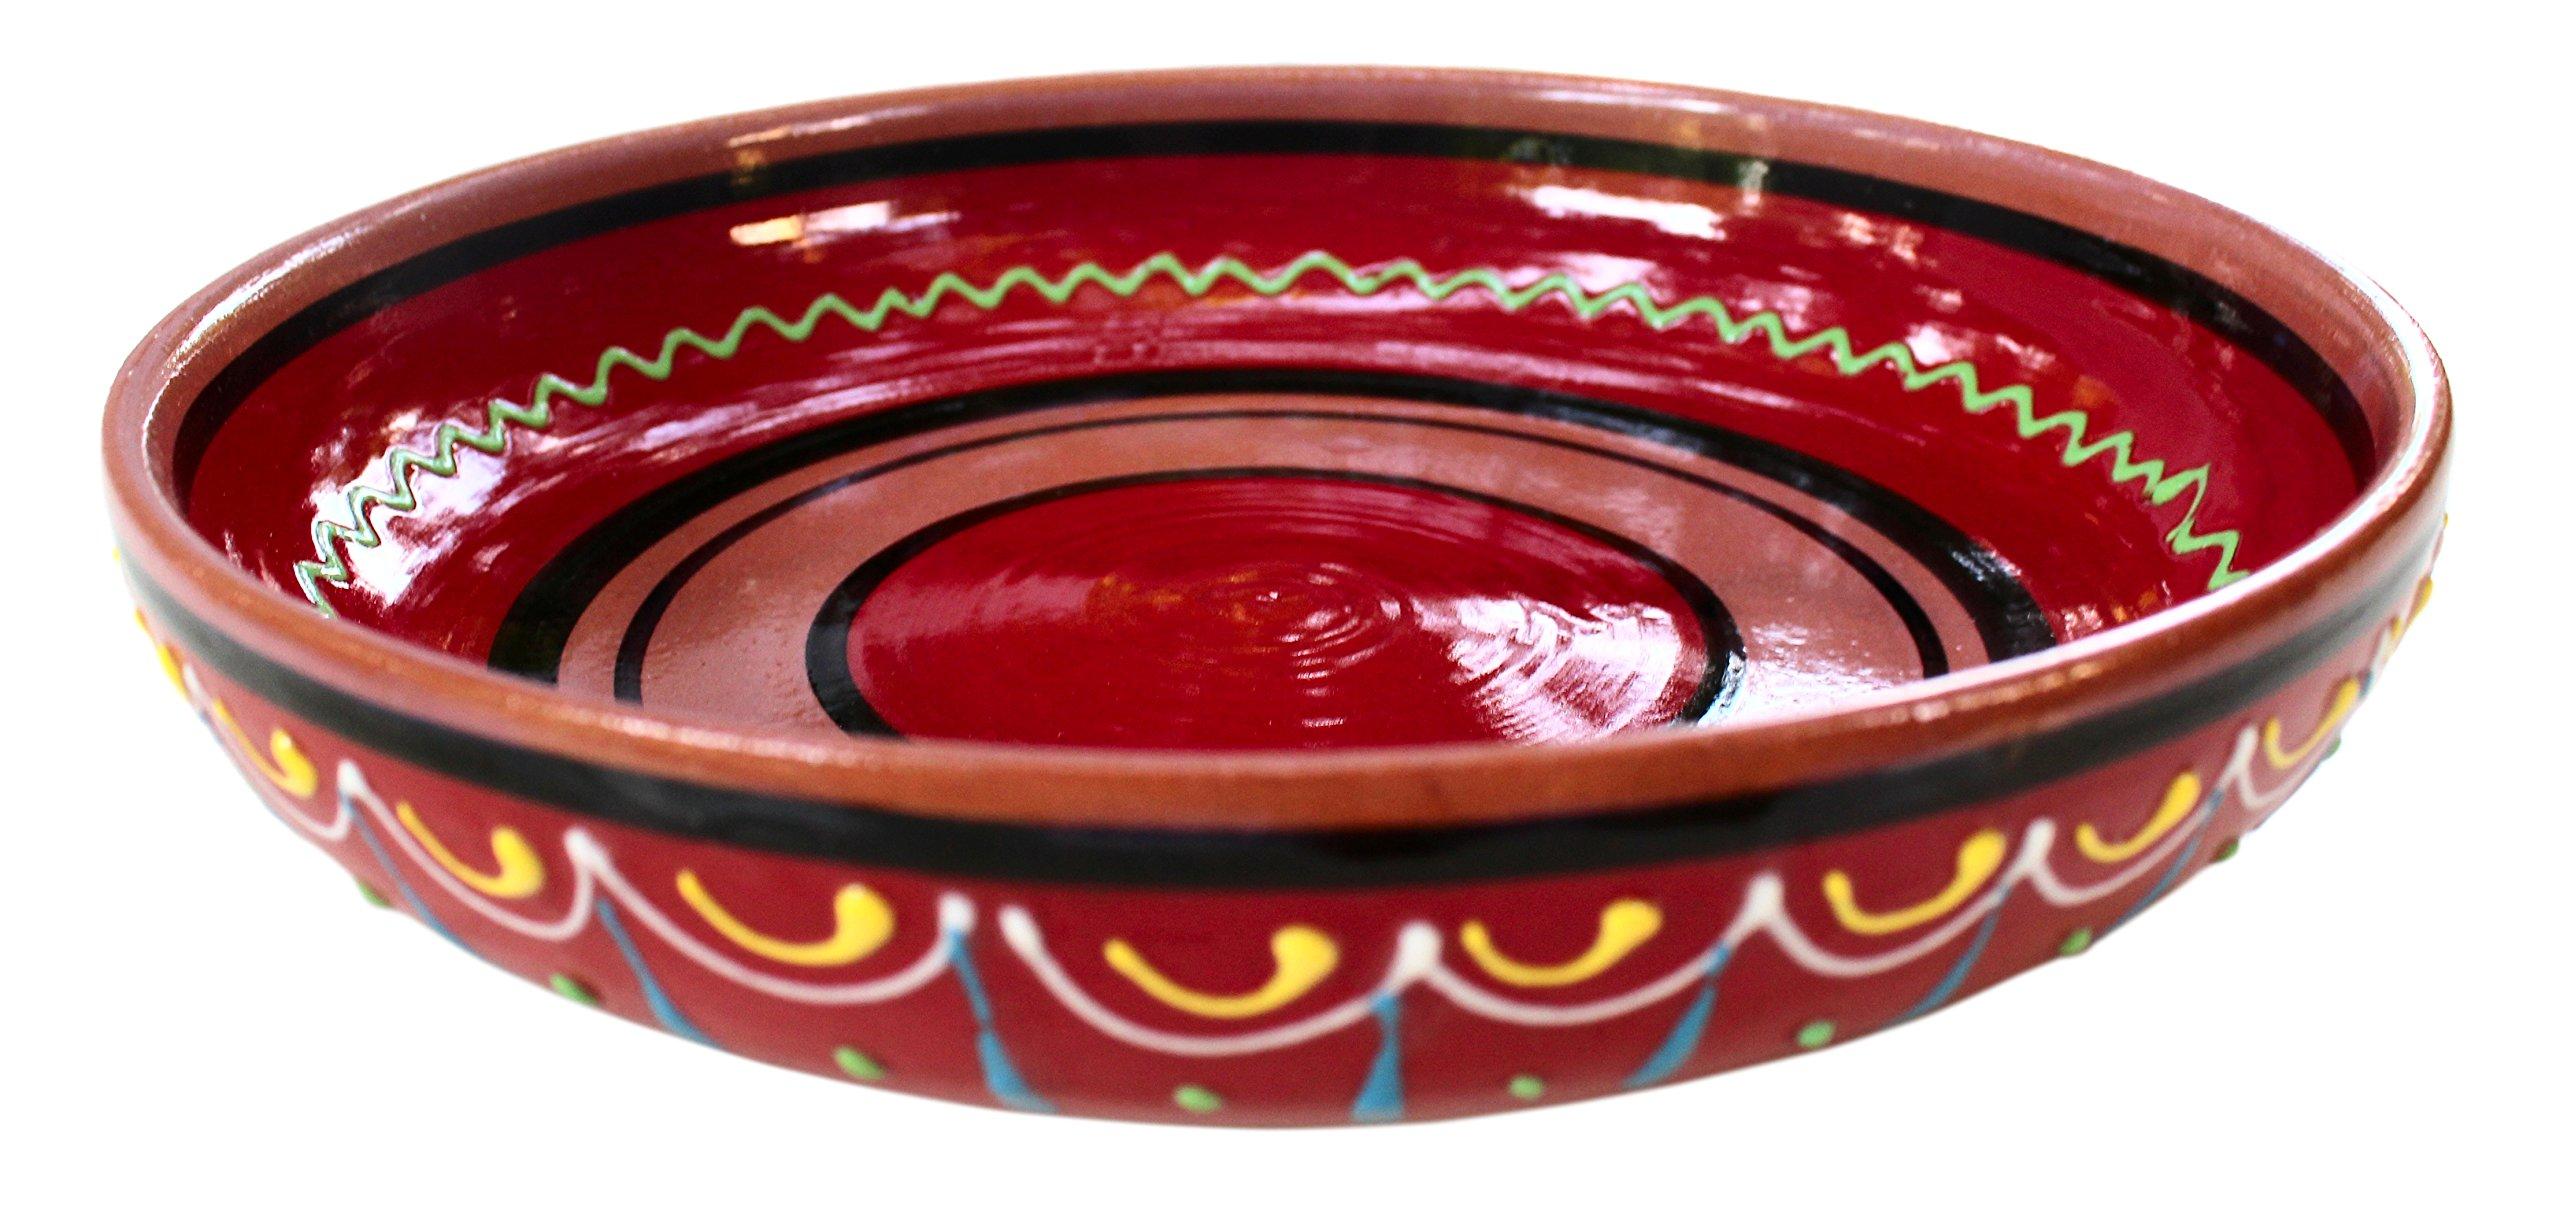 Small terracotta dish